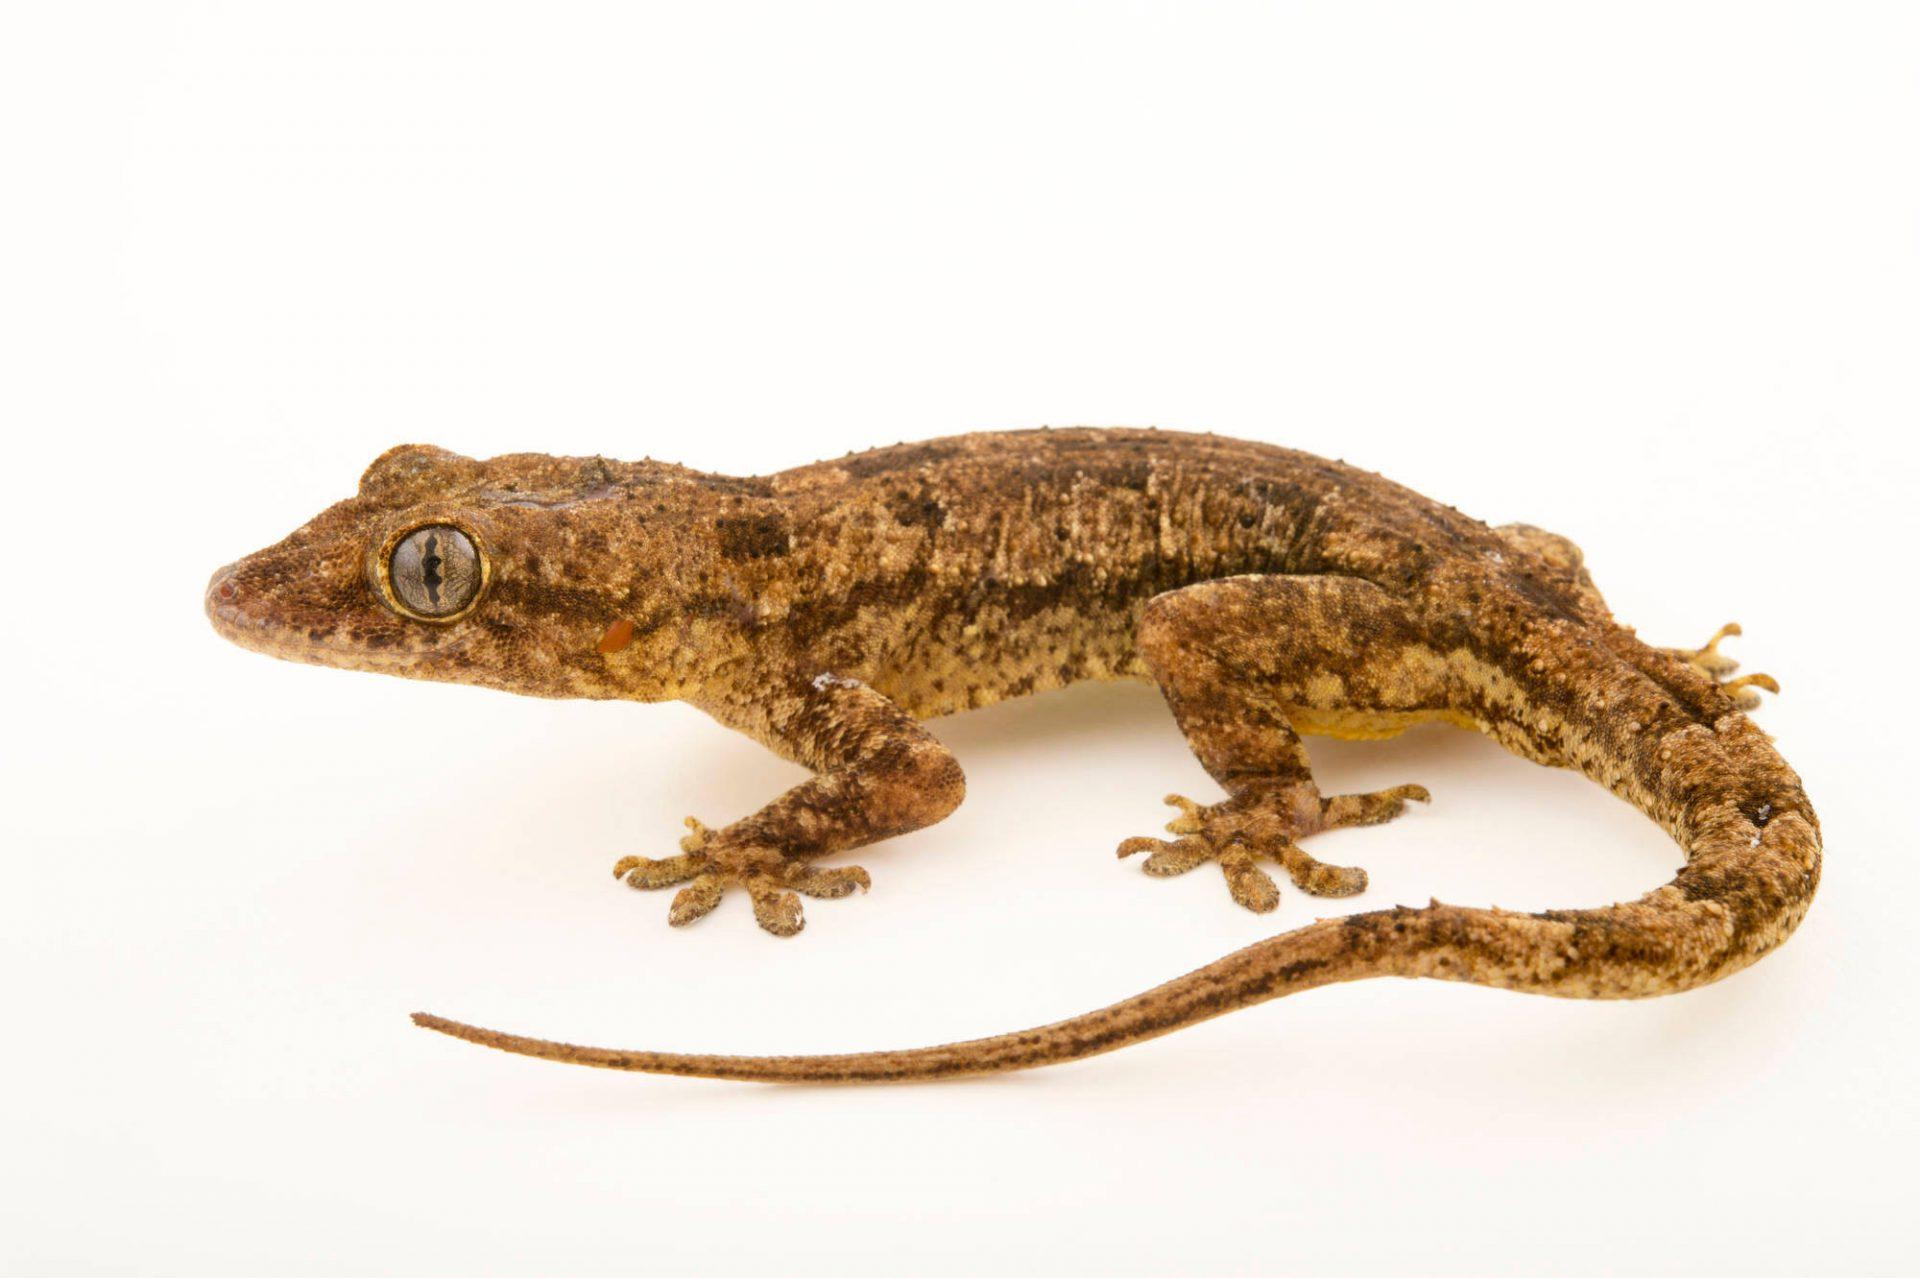 Photo: A flathead leaf toed gecko (Hemidactylus platycephalus) at the Plzen Zoo.